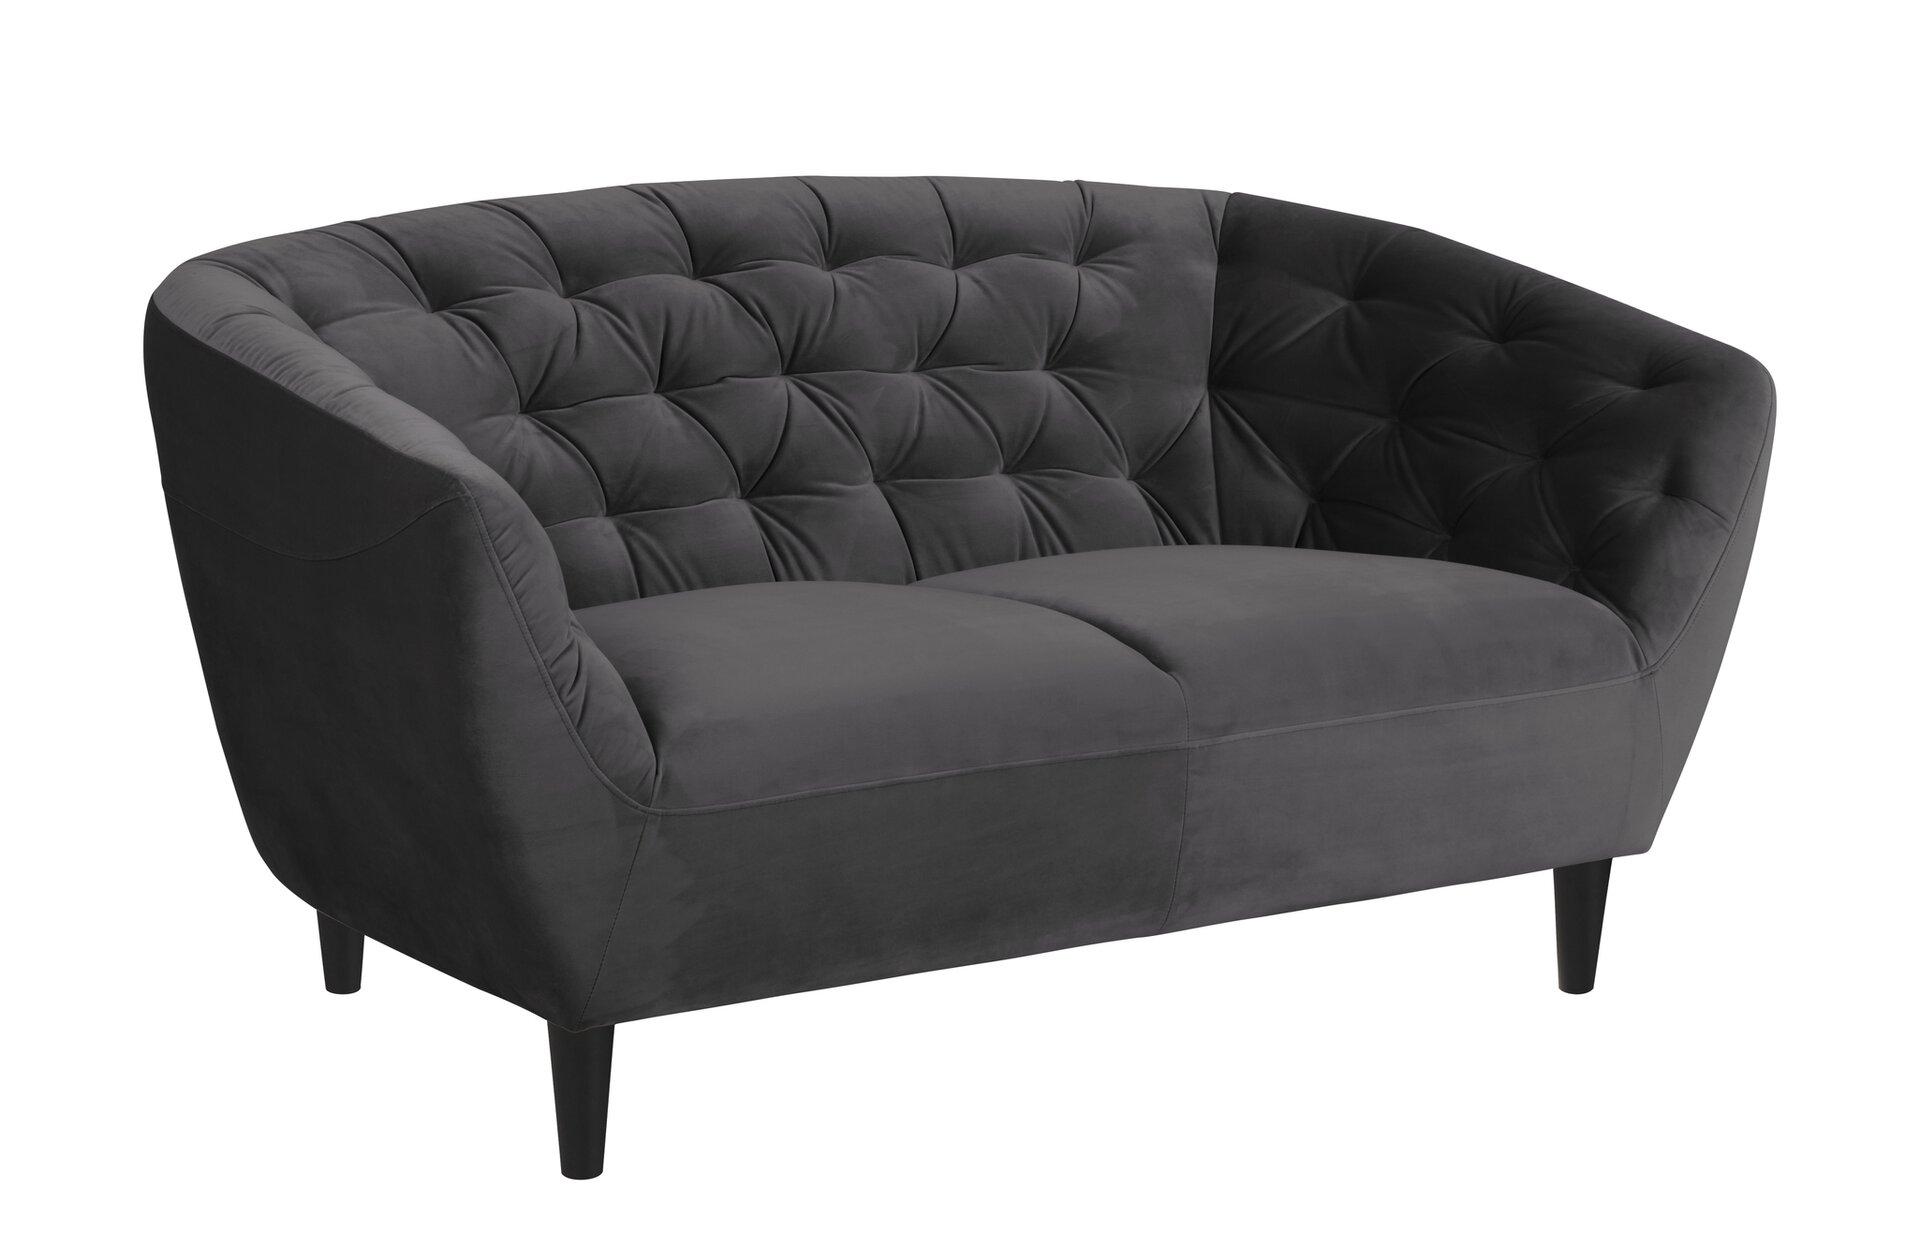 Sofa 3-Sitzer RIA CELECT Textil 84 x 78 x 191 cm